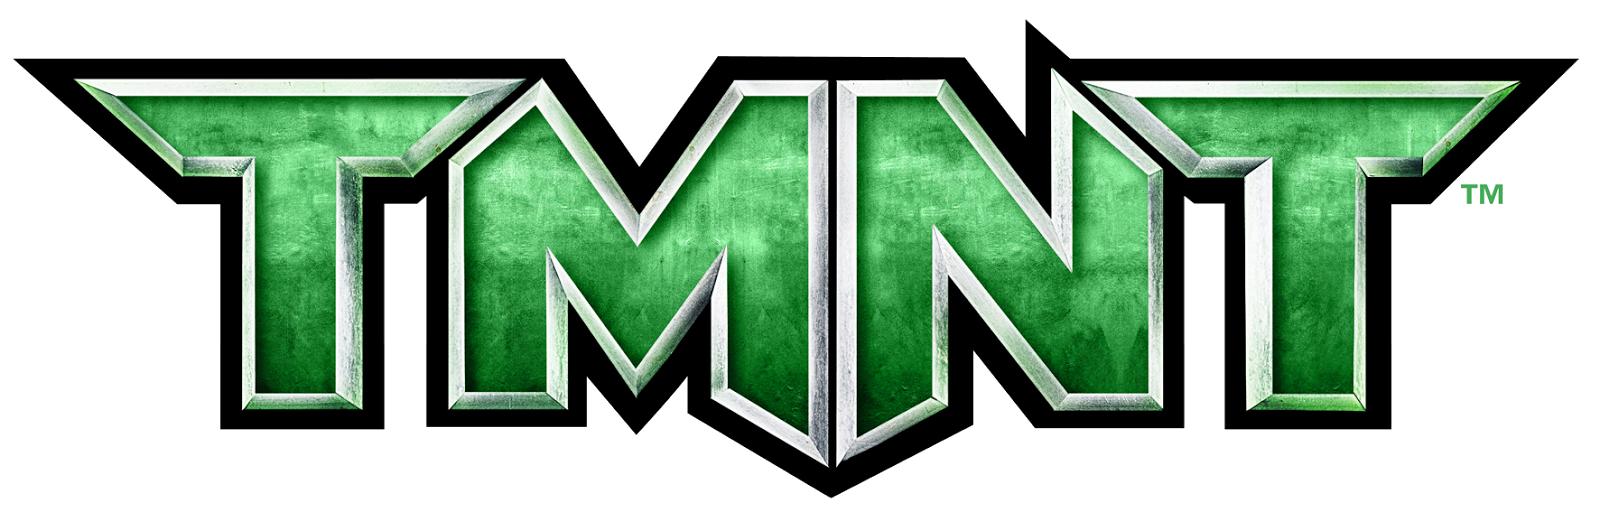 TMNT PNG Transparent Images.